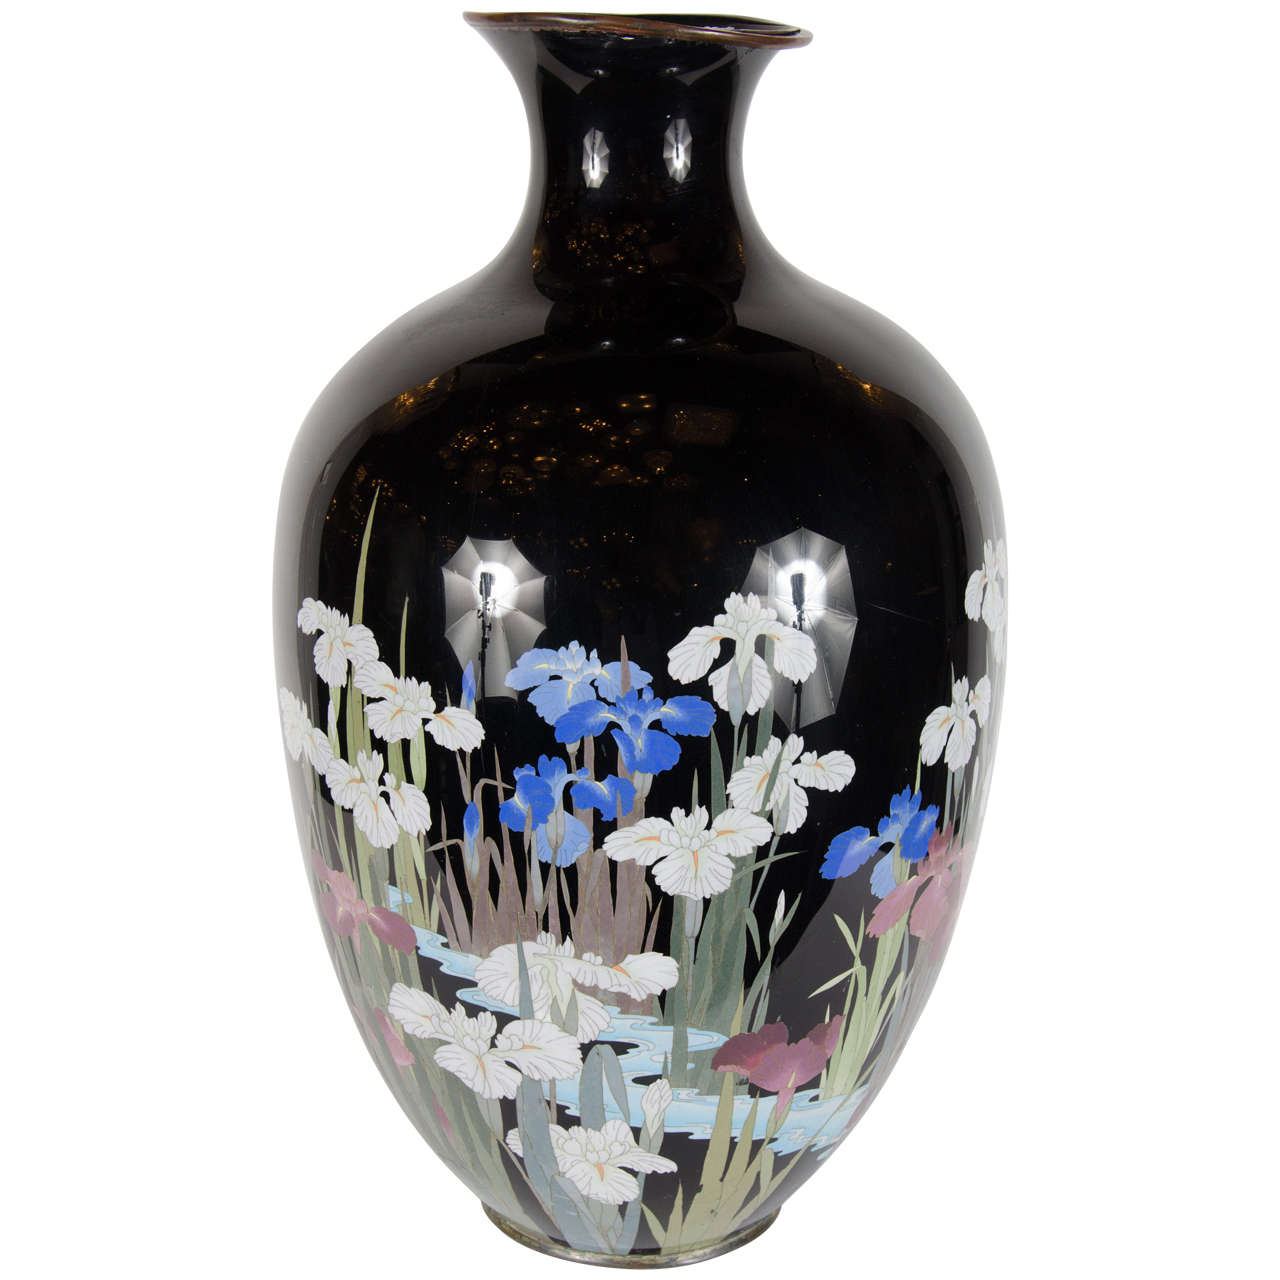 Exquisite hand enameled chinese vase of iris in a water lily pond exquisite hand enameled chinese vase of iris in a water lily pond for sale reviewsmspy